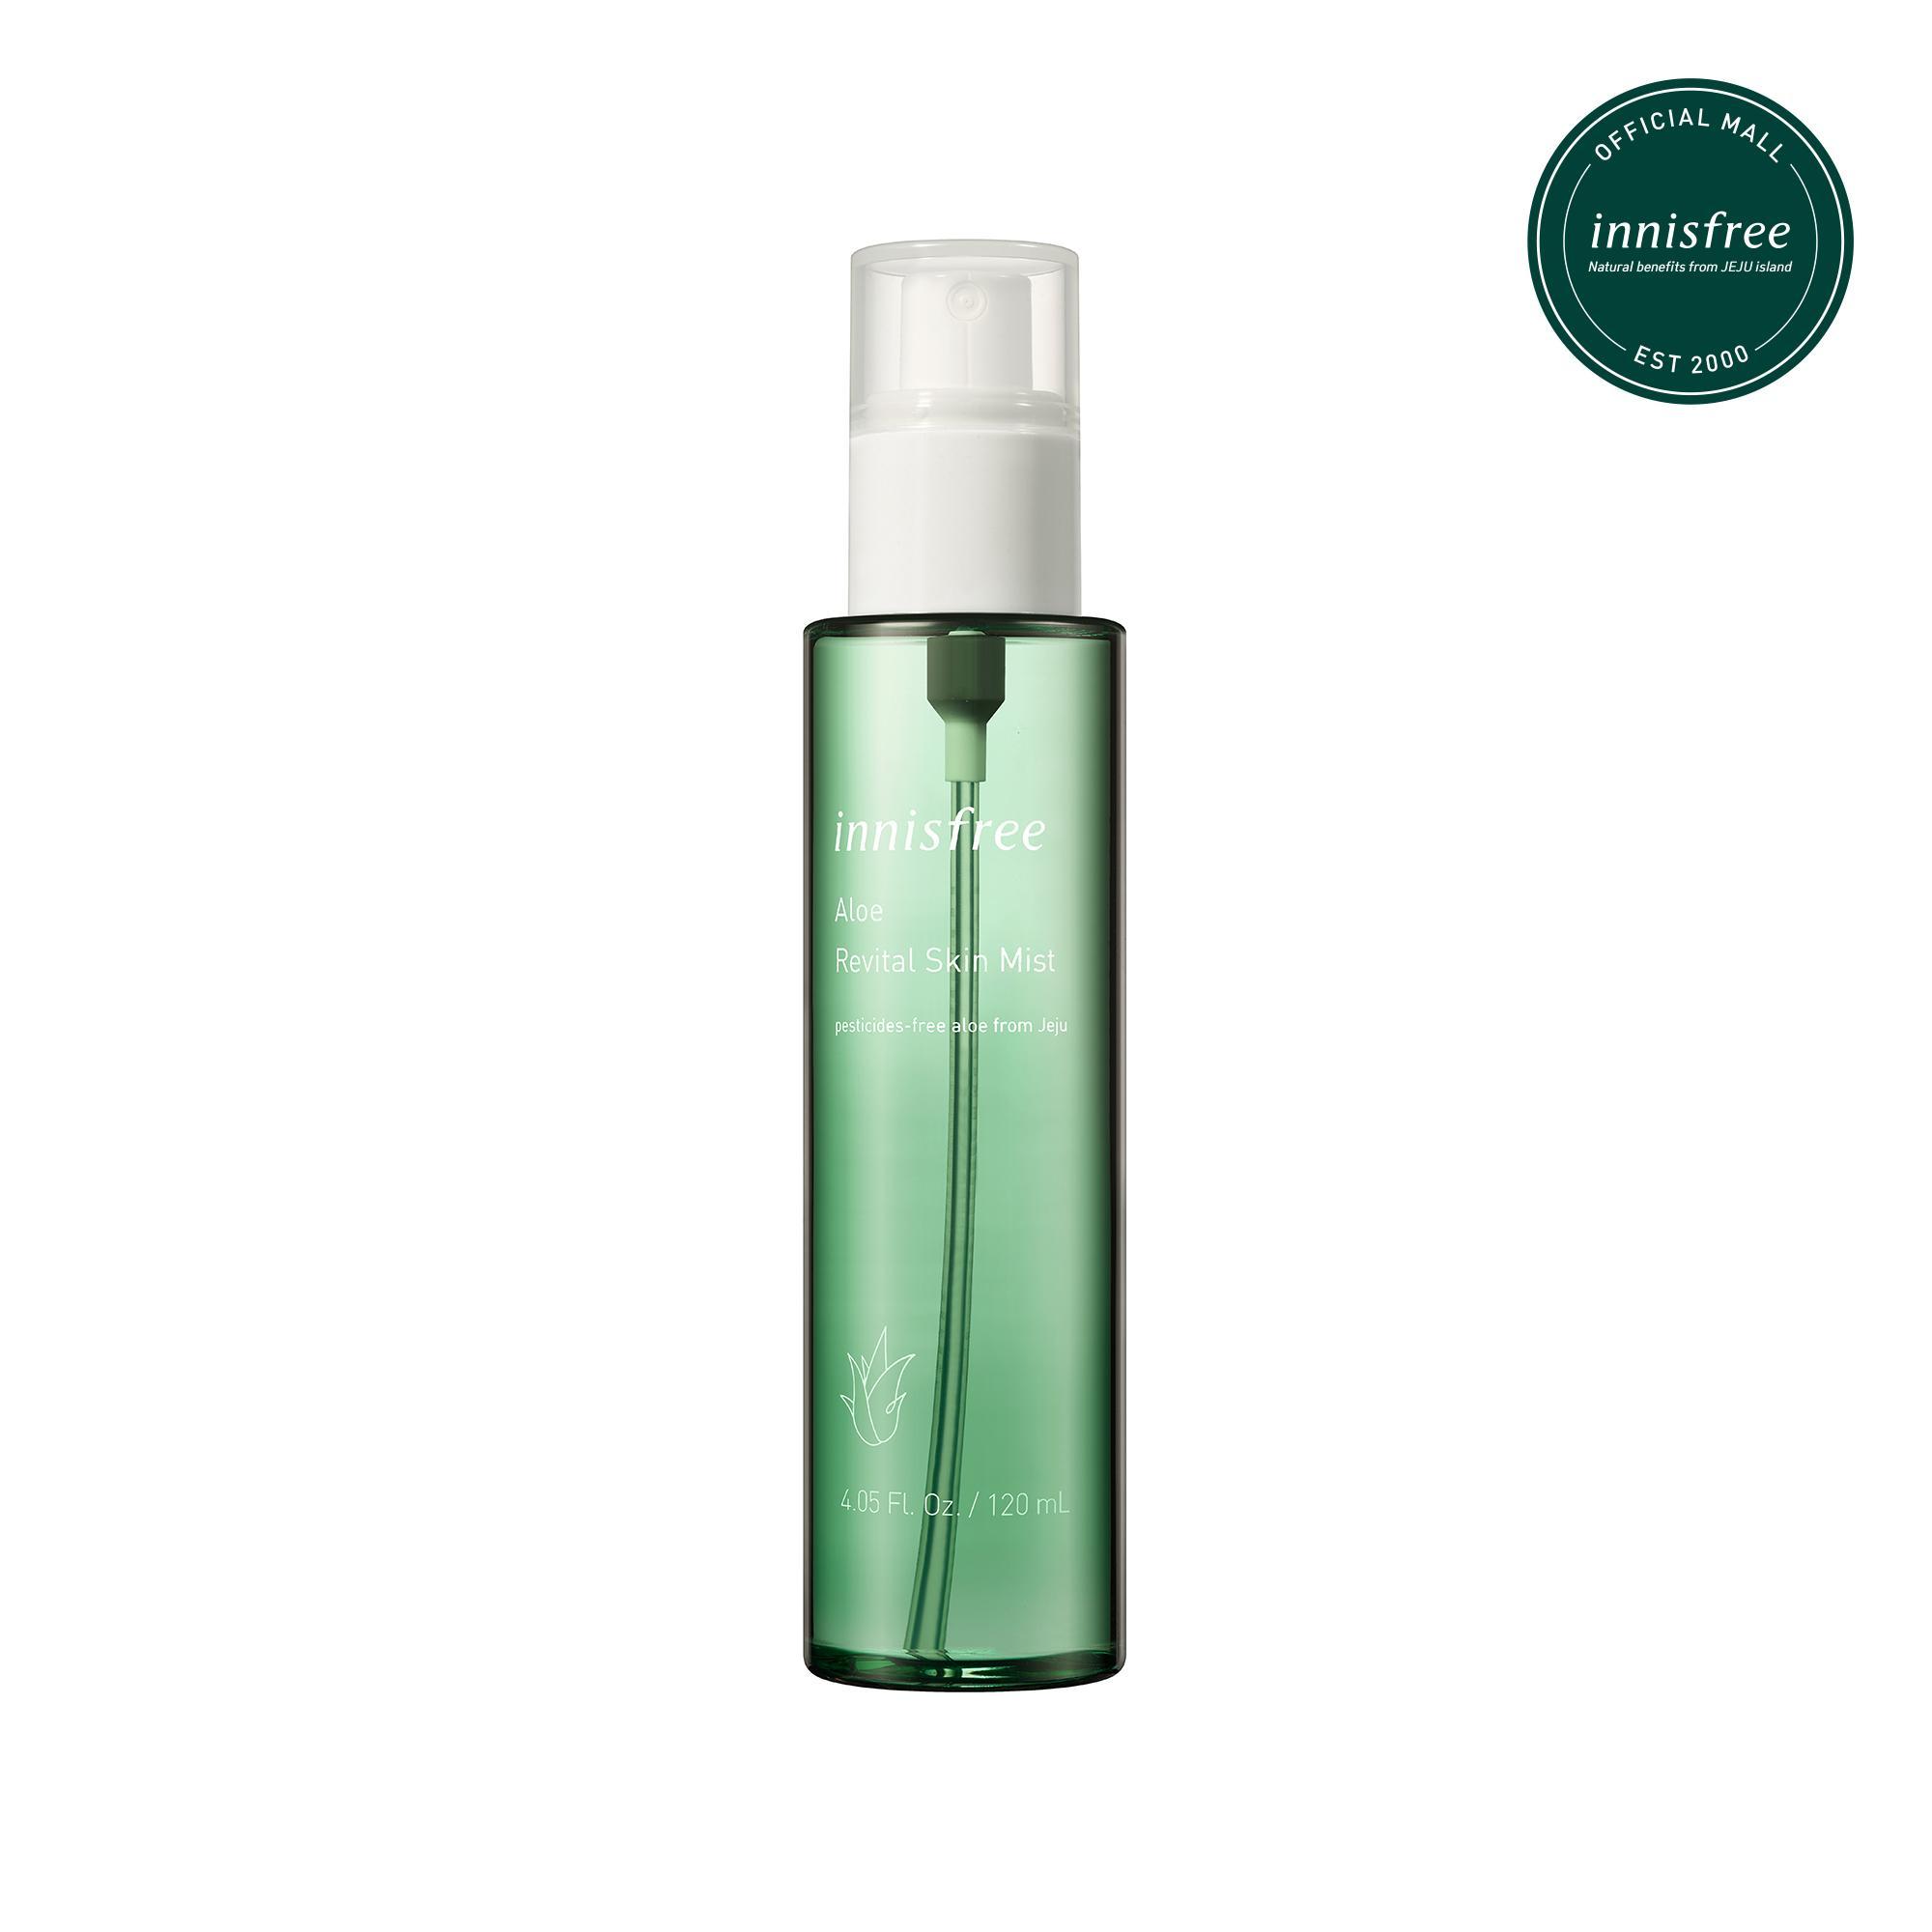 Xịt khoáng dưỡng ẩm, dịu da từ nha đam innisfree Aloe Revital Skin Mist 120ml tốt nhất